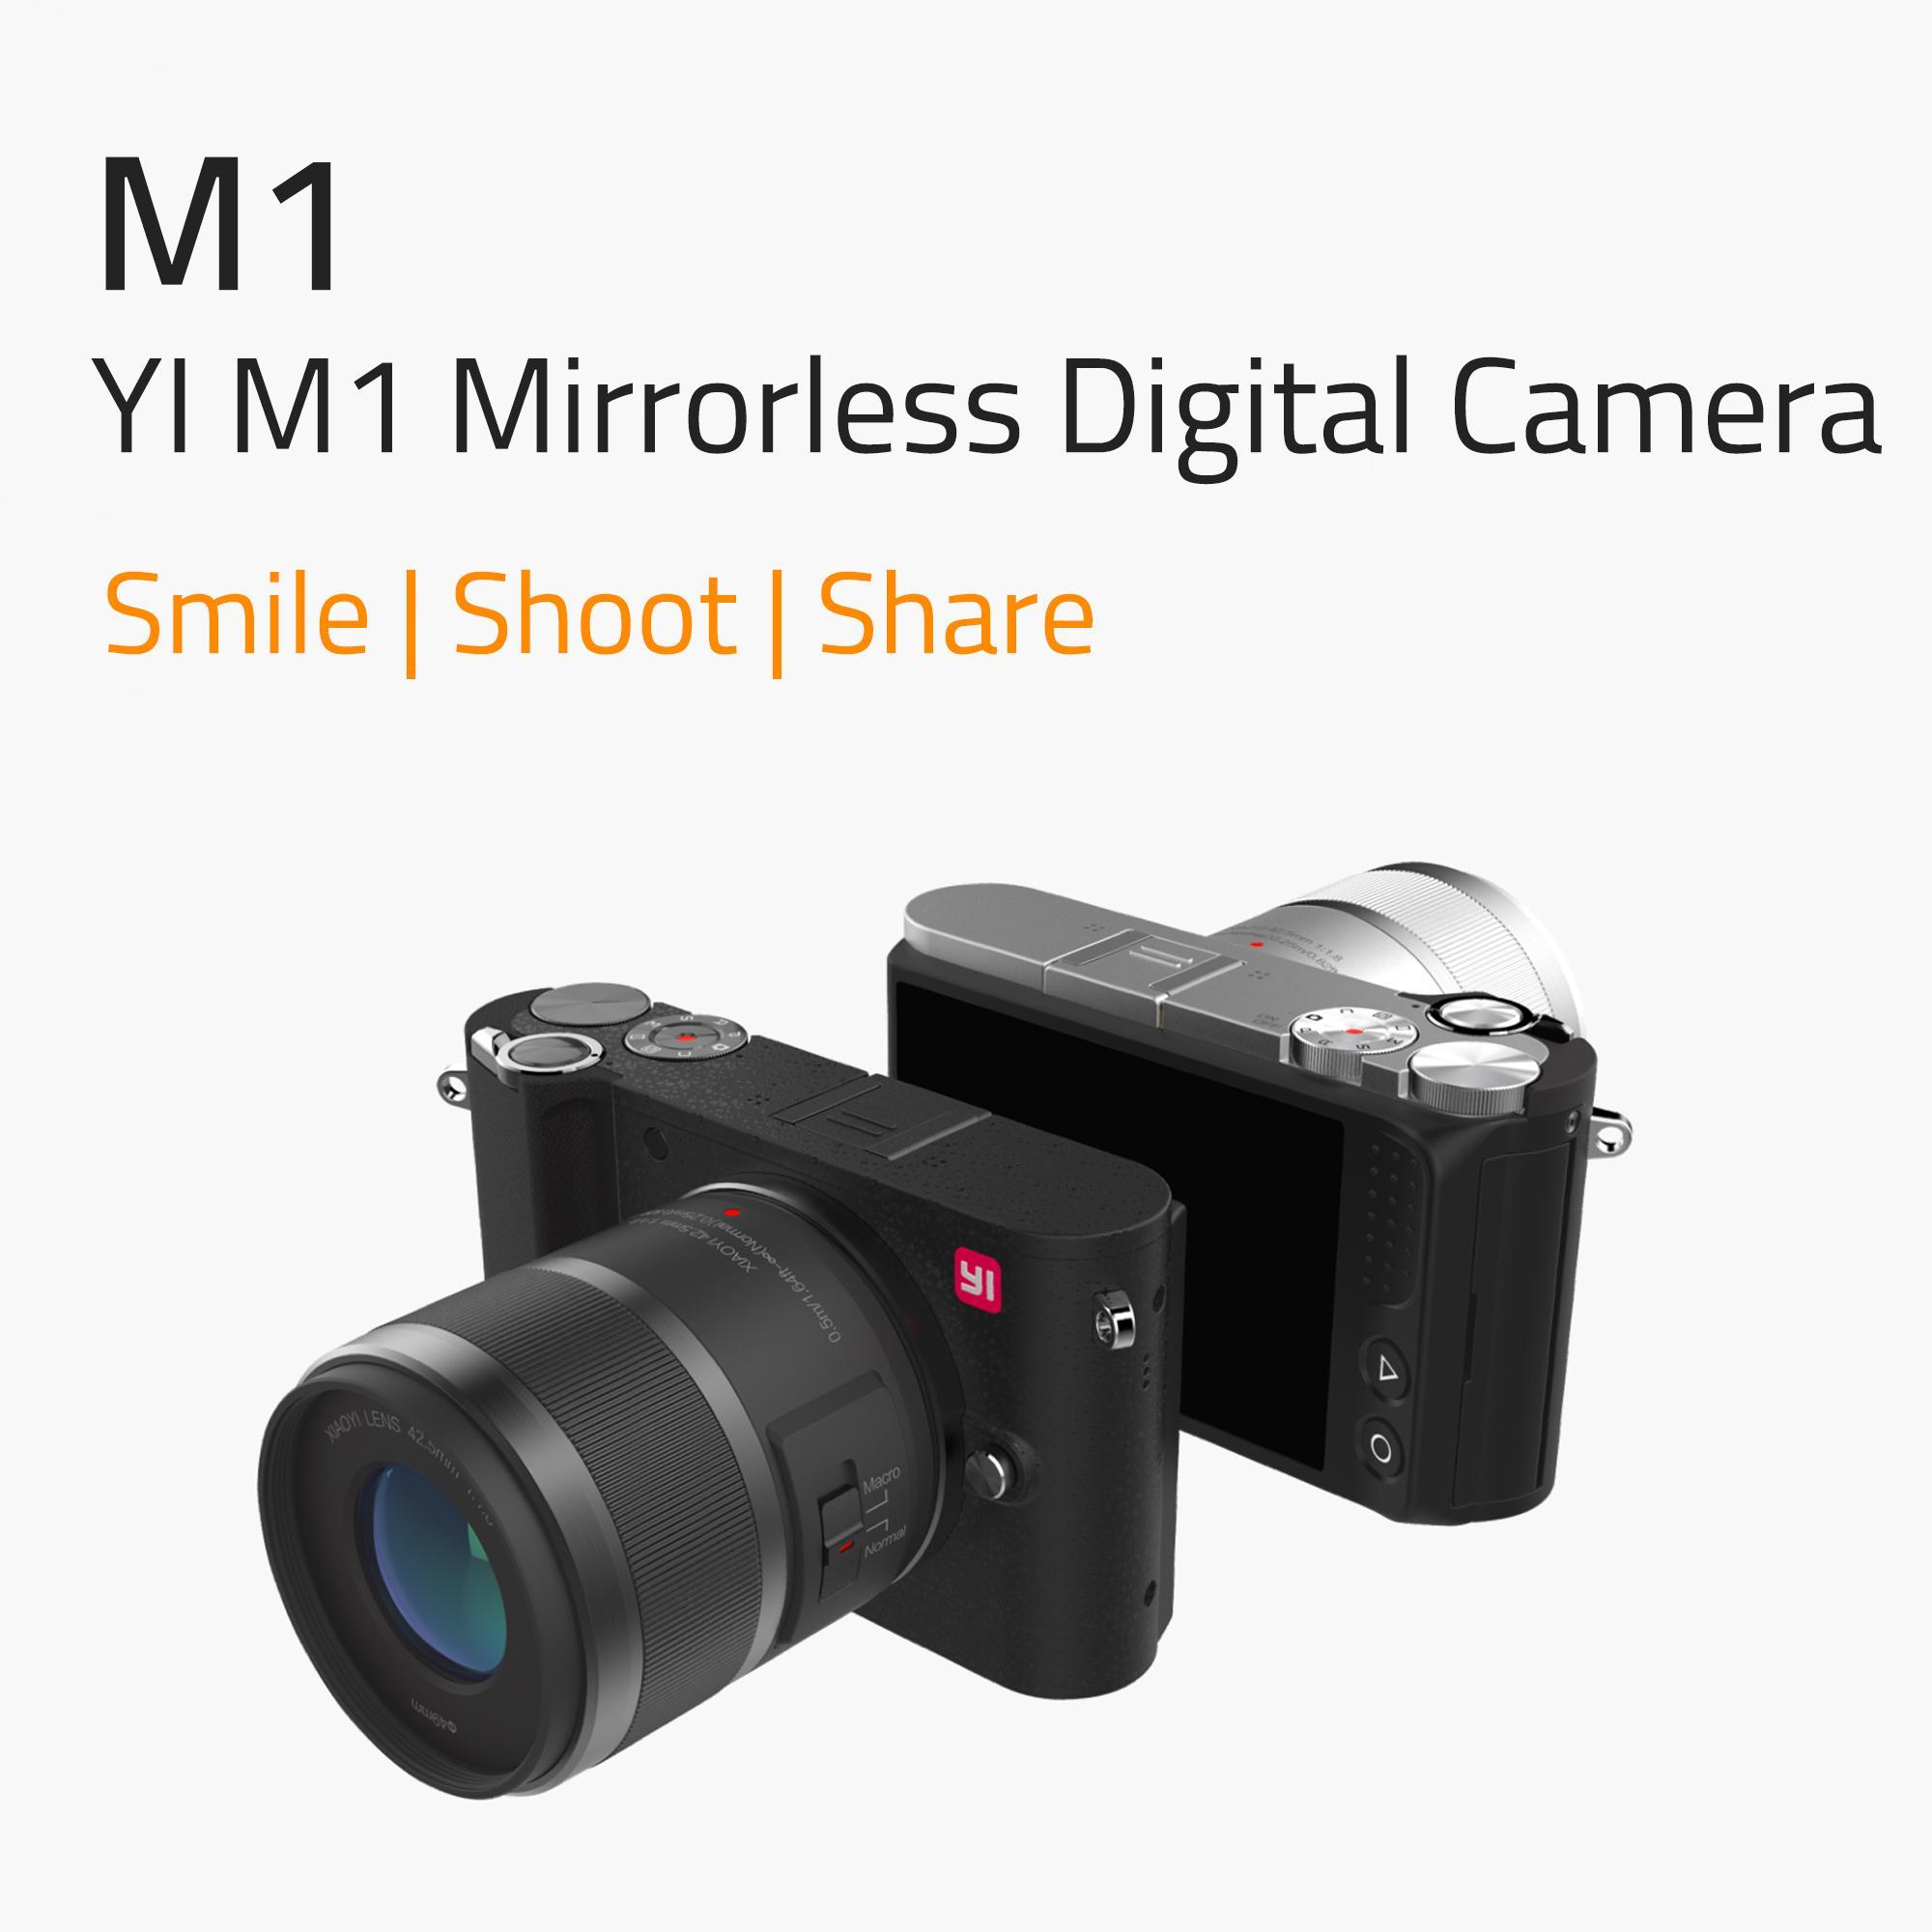 Amazon.com : YI M1 Mirrorless Digital Camera with 12-40mm